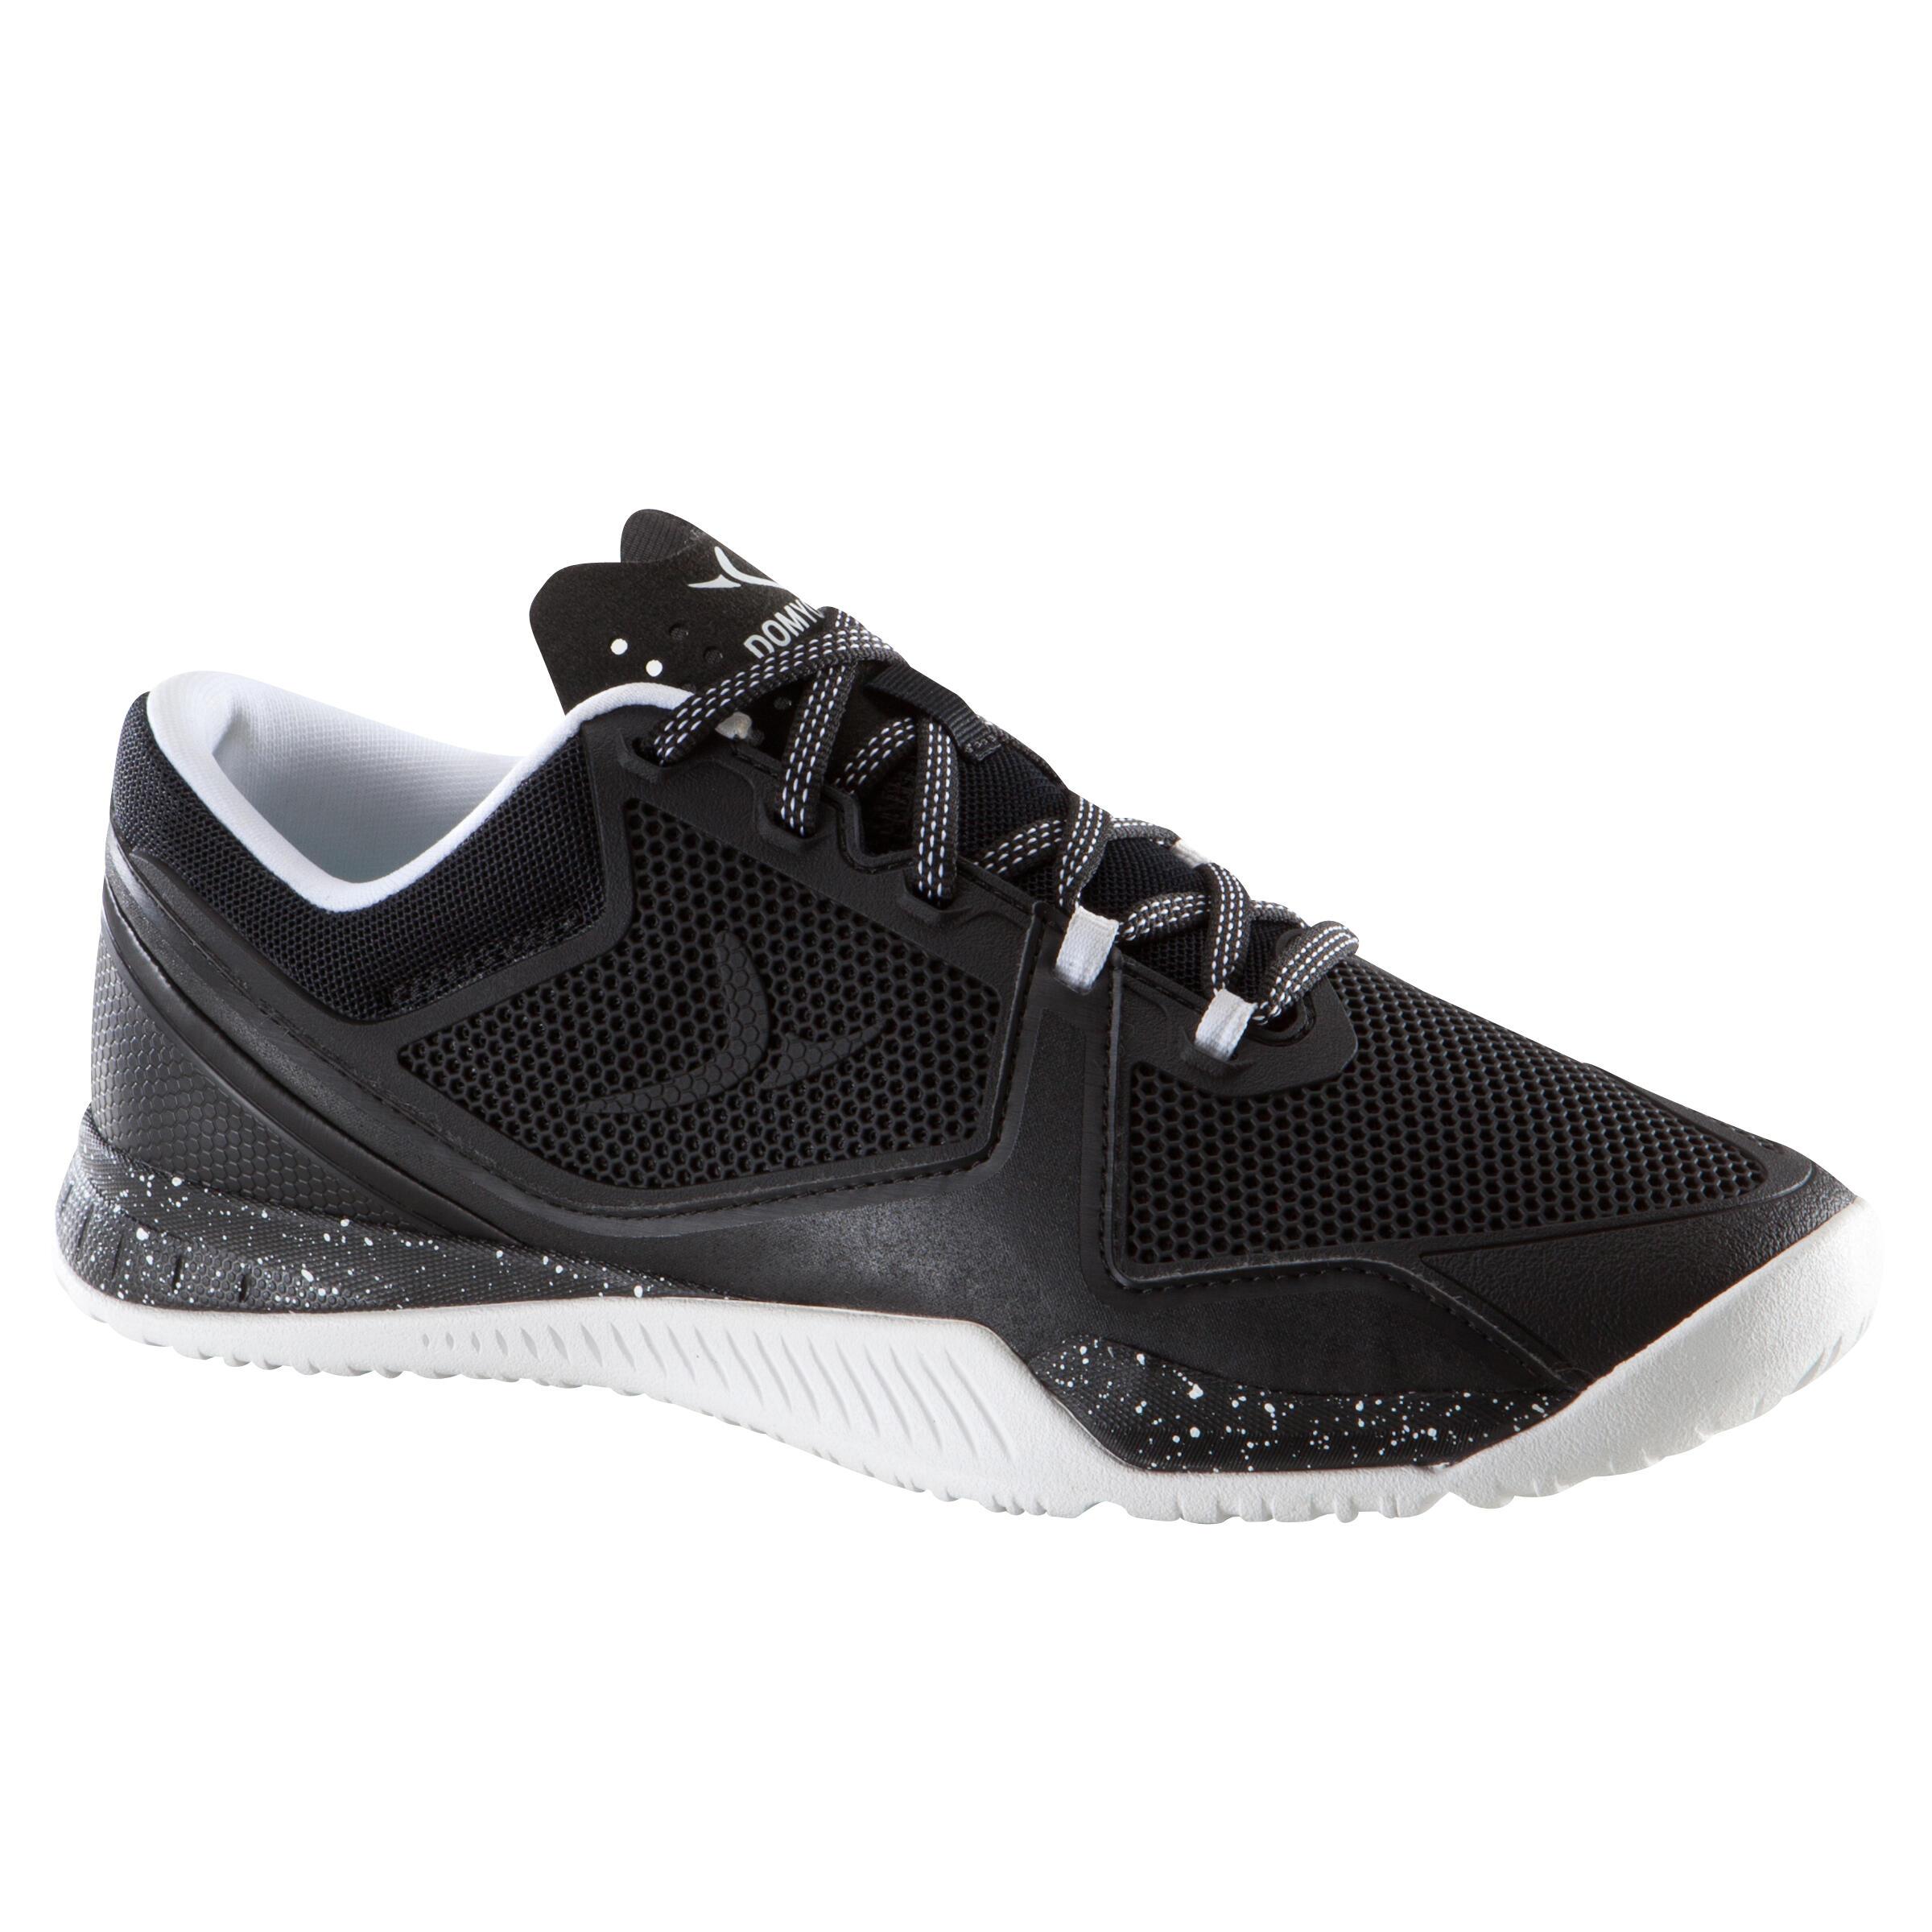 Best Women's Cross-Training Shoes For